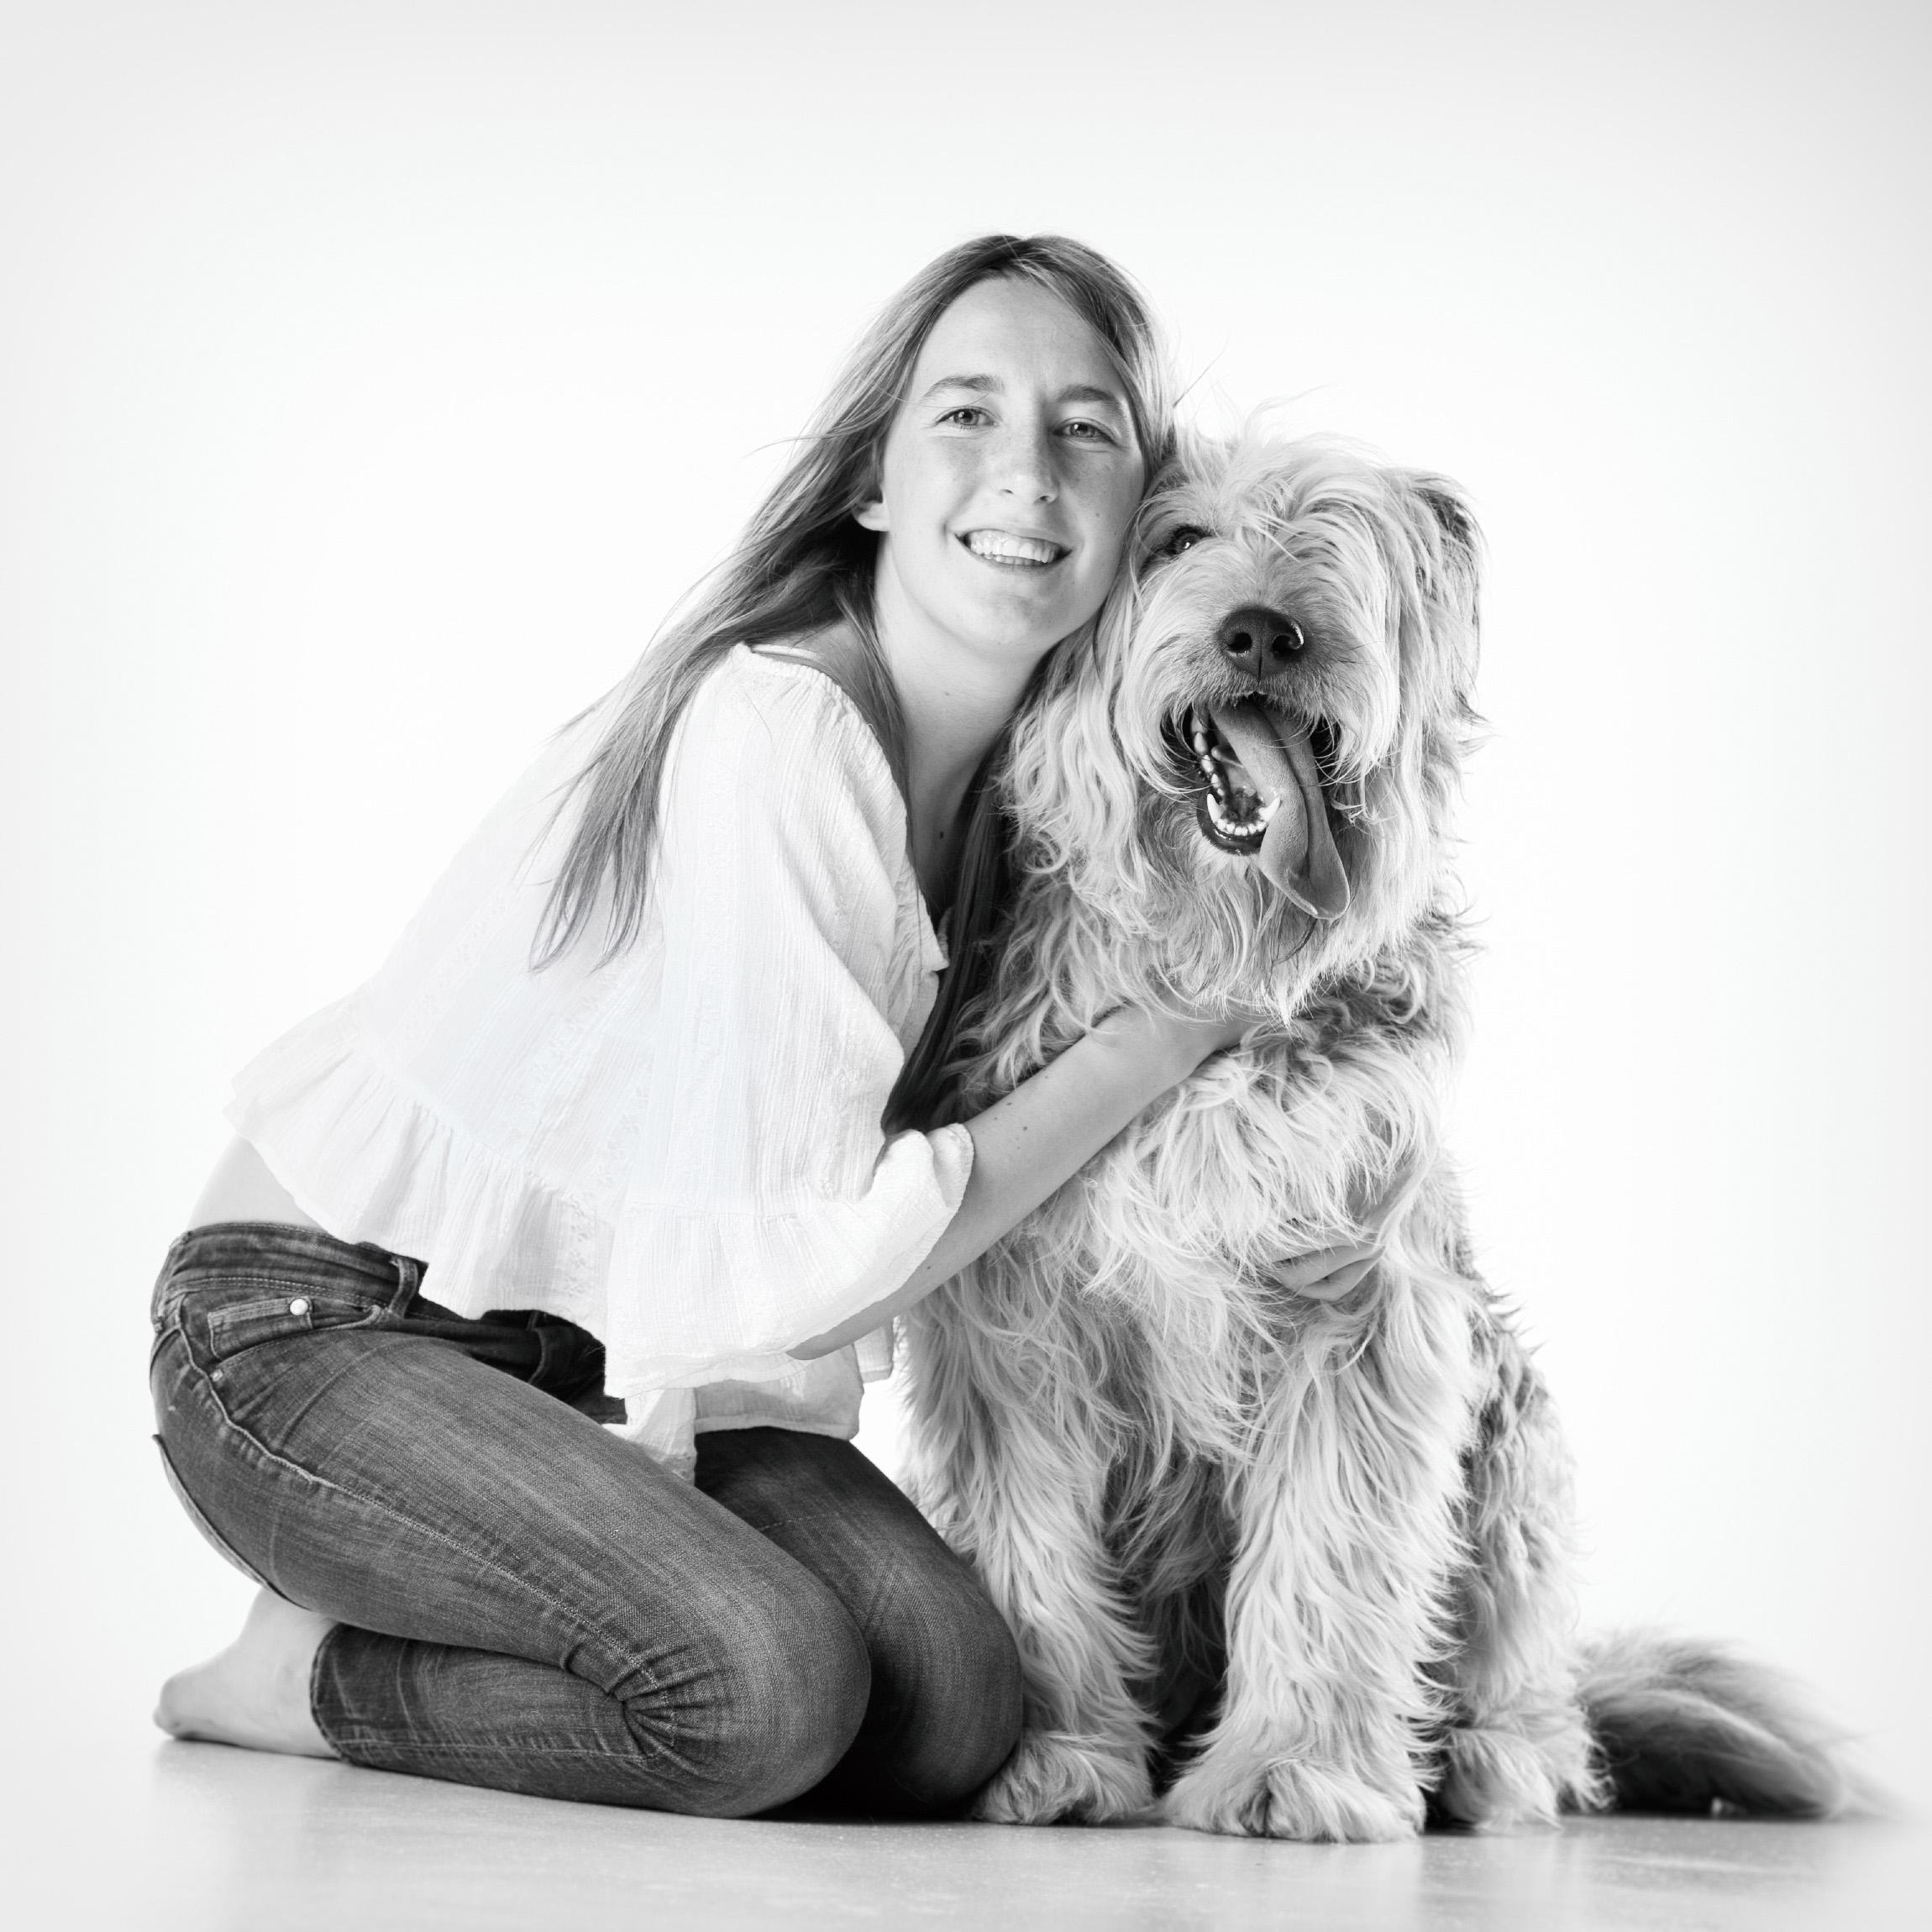 06 foto-gossos-celine-pech-andorra-0152